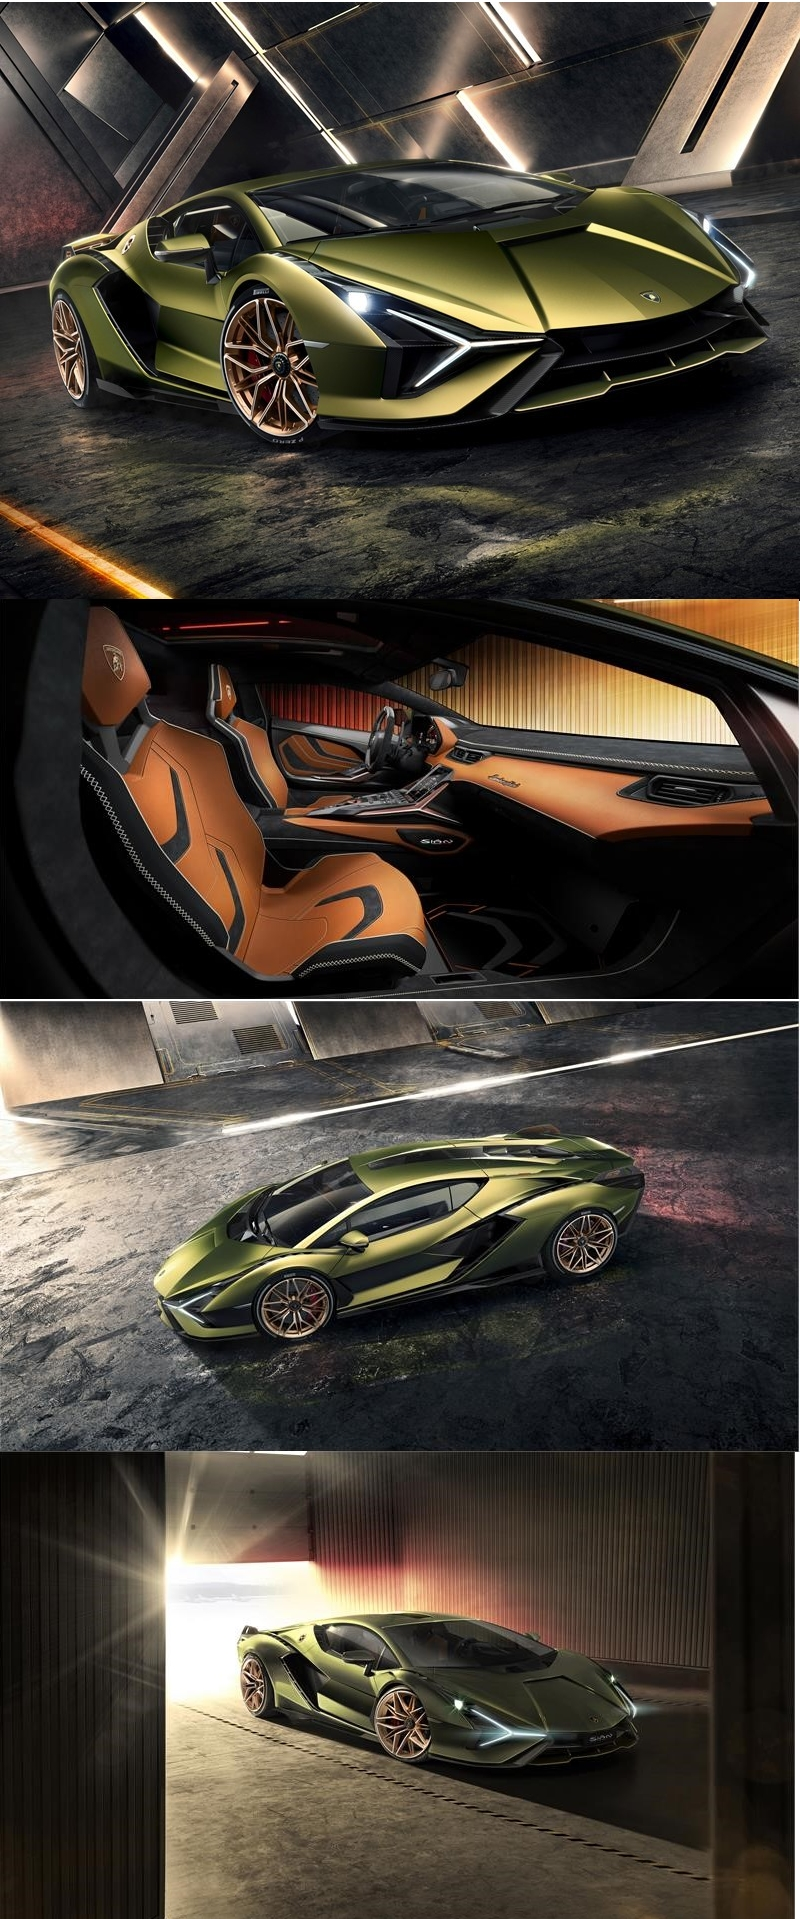 2019 Lamborghini Sián represents the first step in Lamborghini's route to electrification